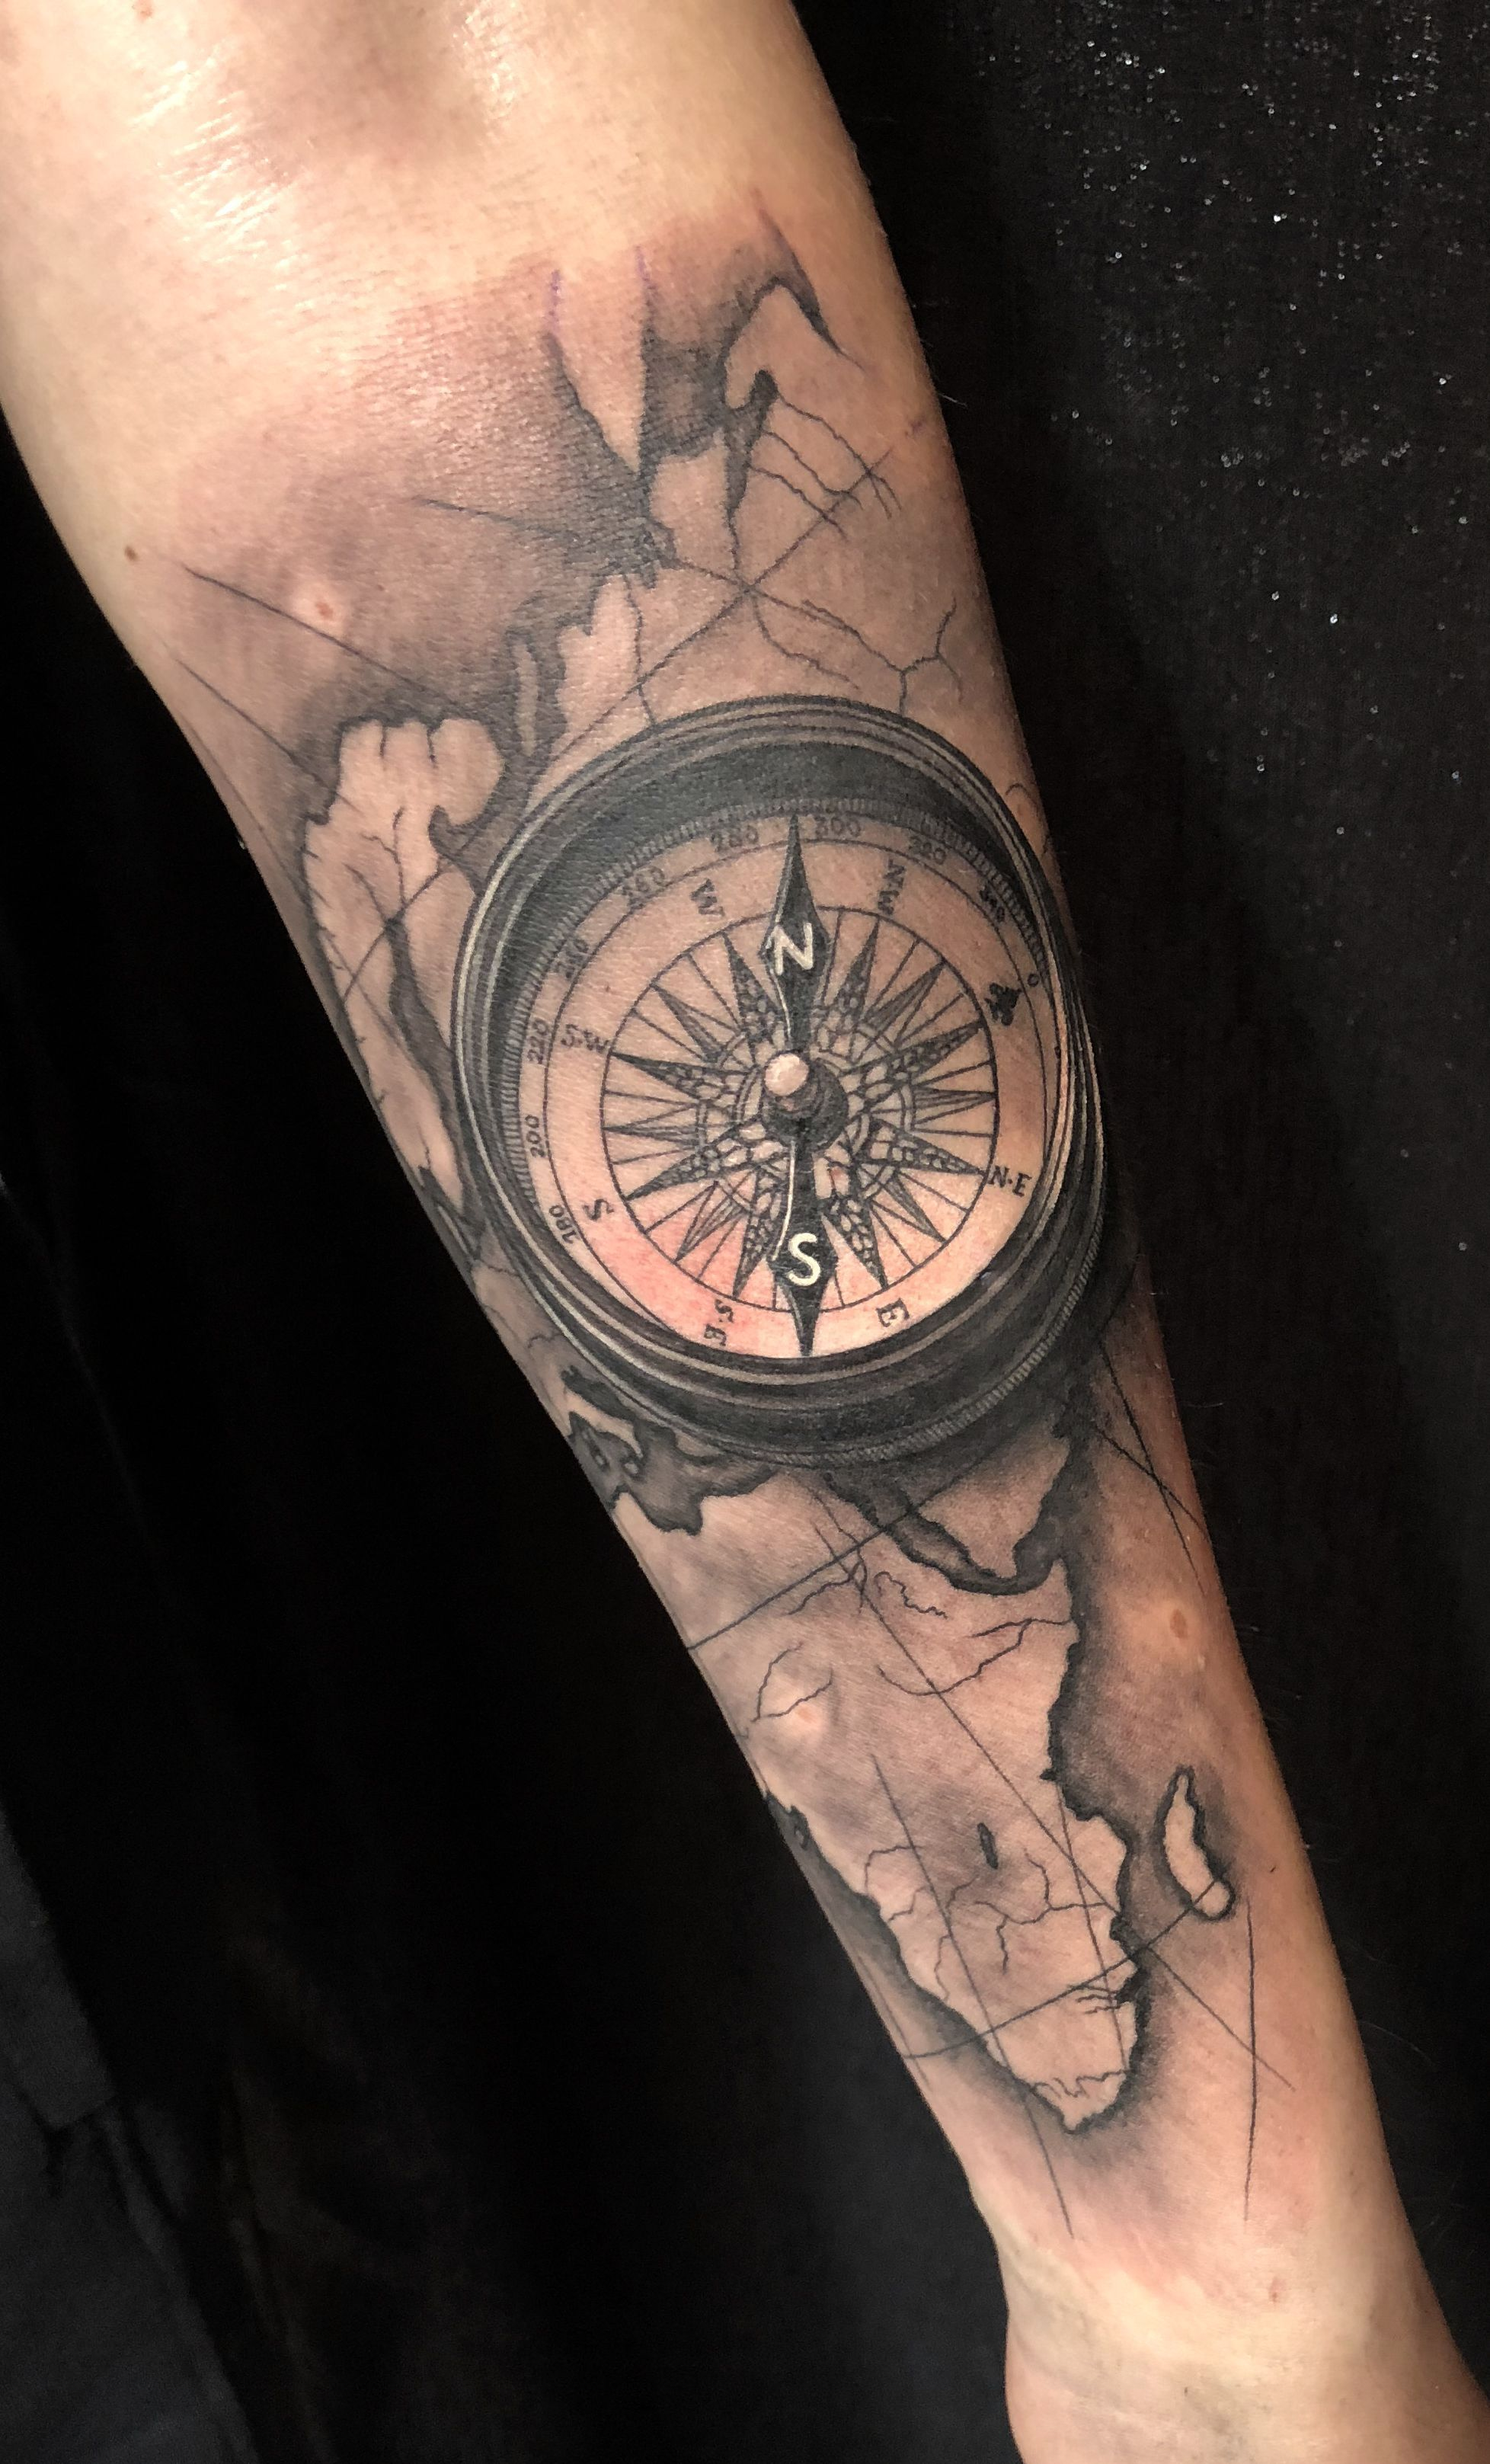 @westend_tattoo #westendtattooandpiercing #tattoo #arm tattoo #compass tattoo #m...-#Arm #awestend #cattatto #compass #coupletatto #shouldertatto #snaketatto #tattoantebrazo #tattohombre #tattosketches #tattoo #traditionaltatto #westendtattoo #westendtattooandpiercing- @westend_tattoo #westendtattooandpiercing #tattoo #arm tattoo #compass tattoo #map tattoo